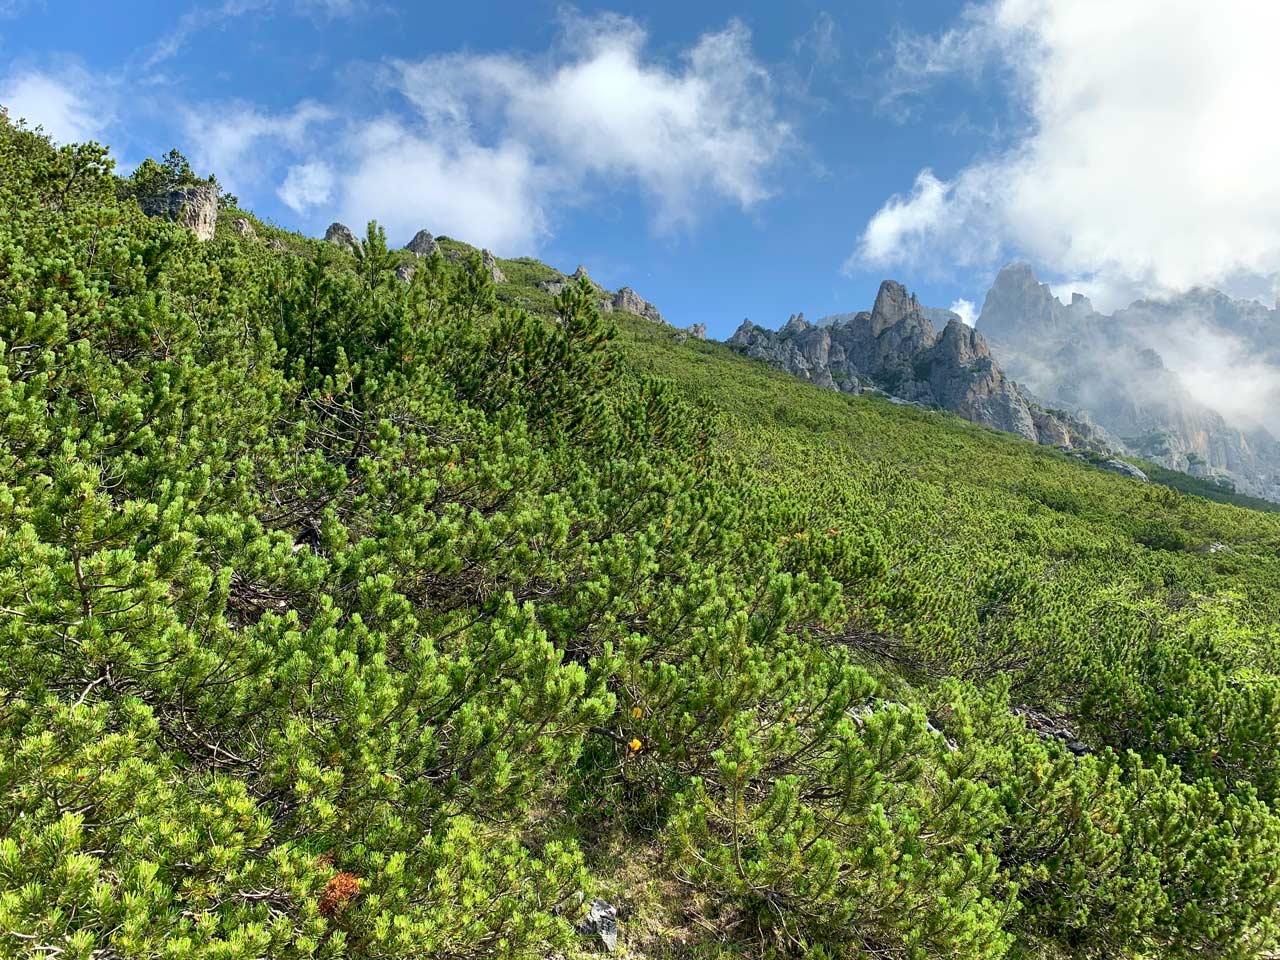 8-pino-mugo-sentiero-misurina-col-de-varda-rifugio-citta-di-carpi